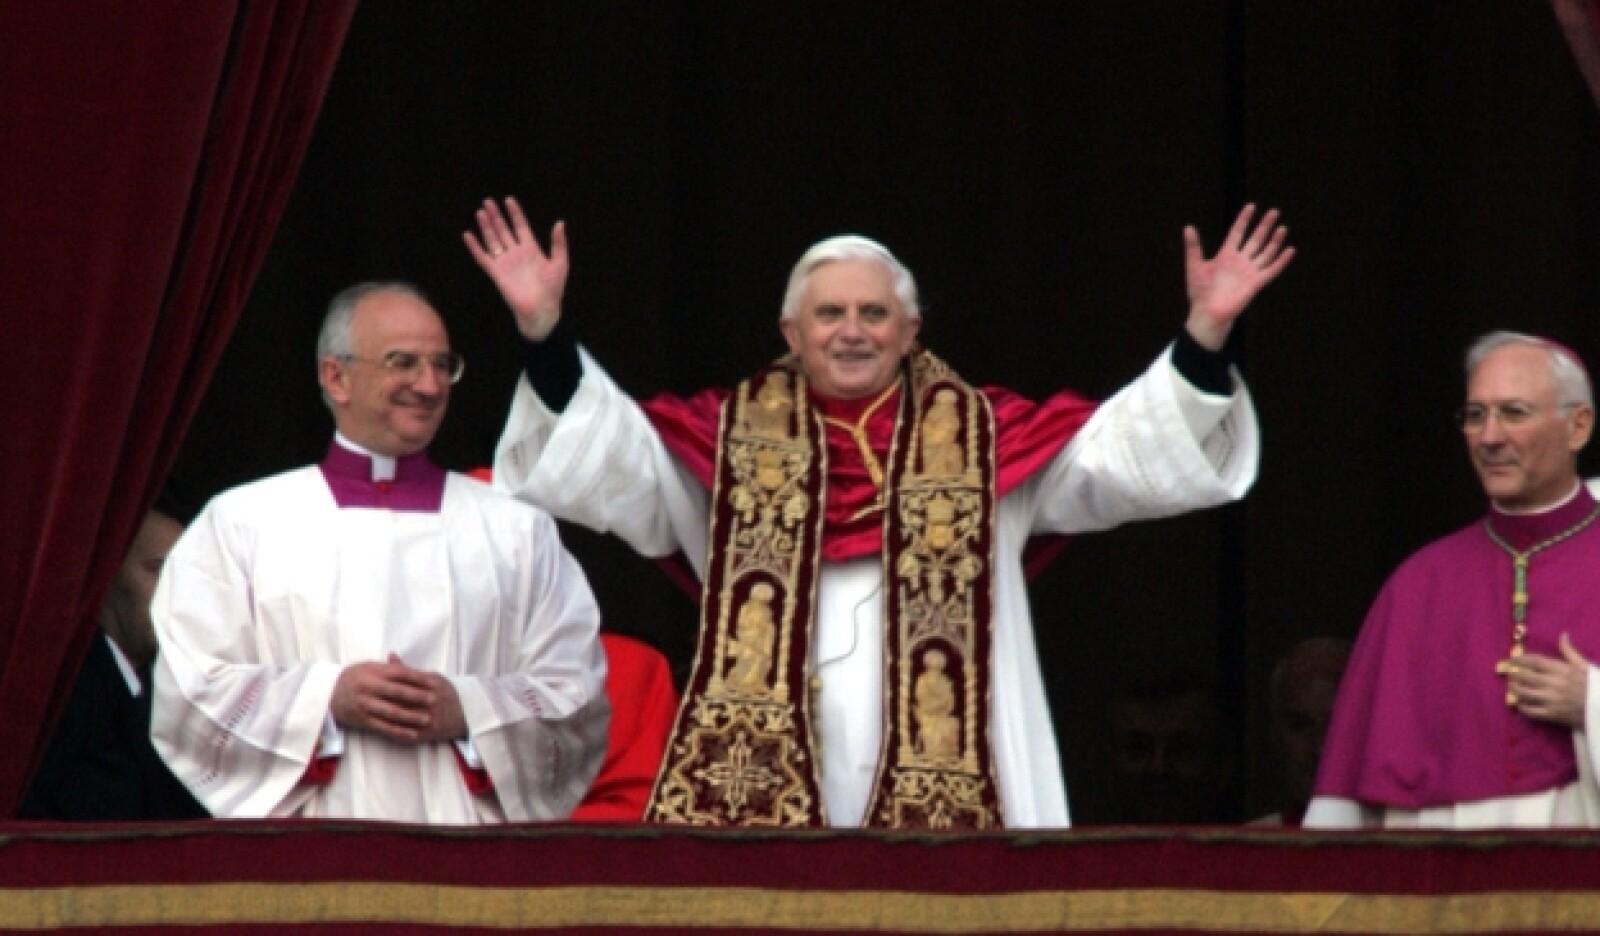 Benedicto XVI papado 13